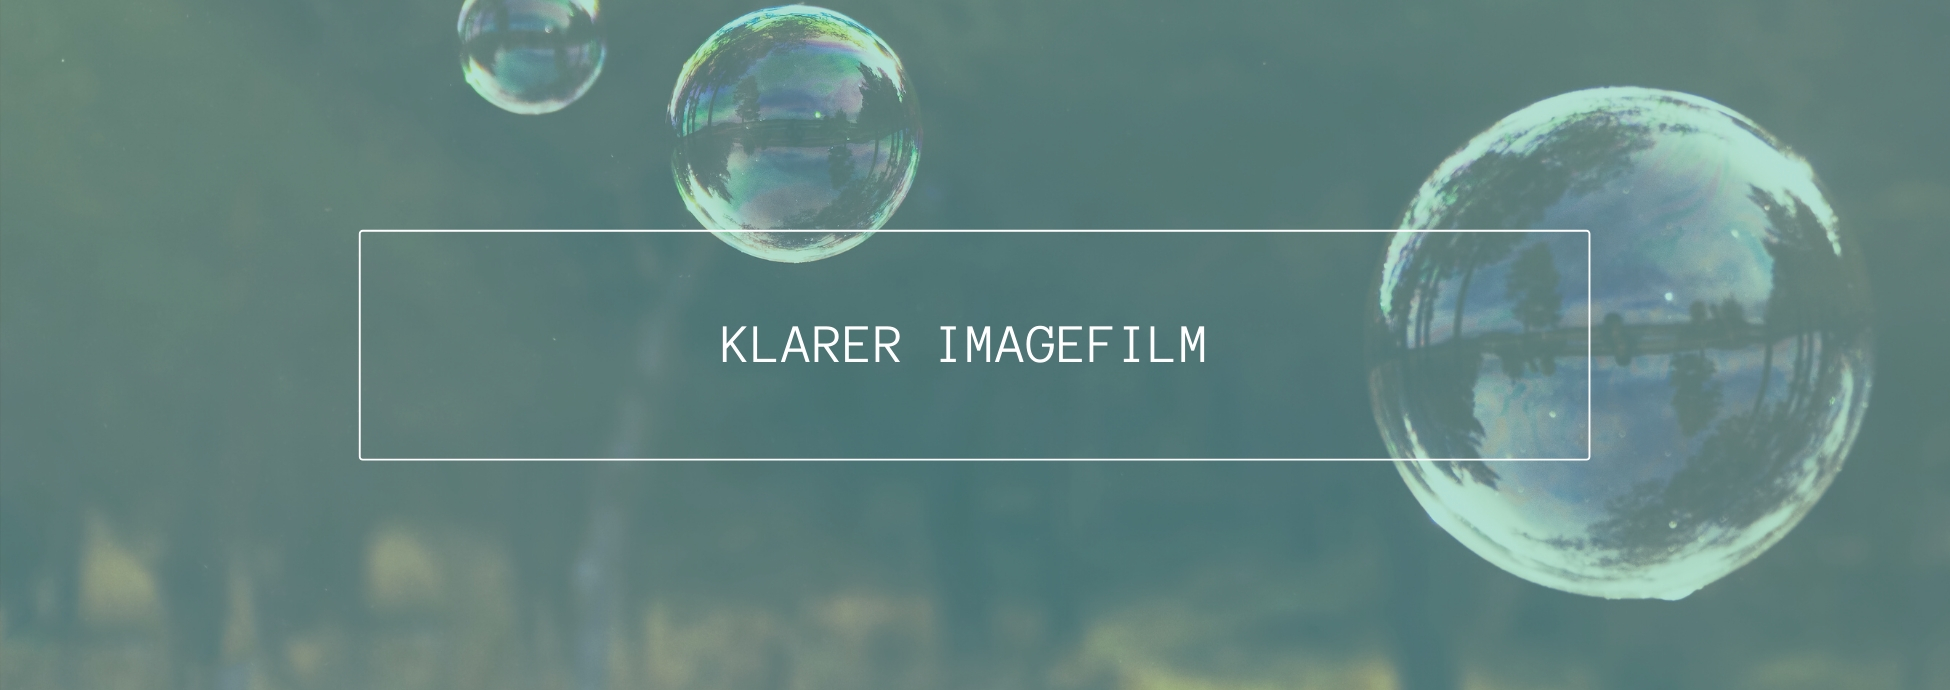 header imagefilm